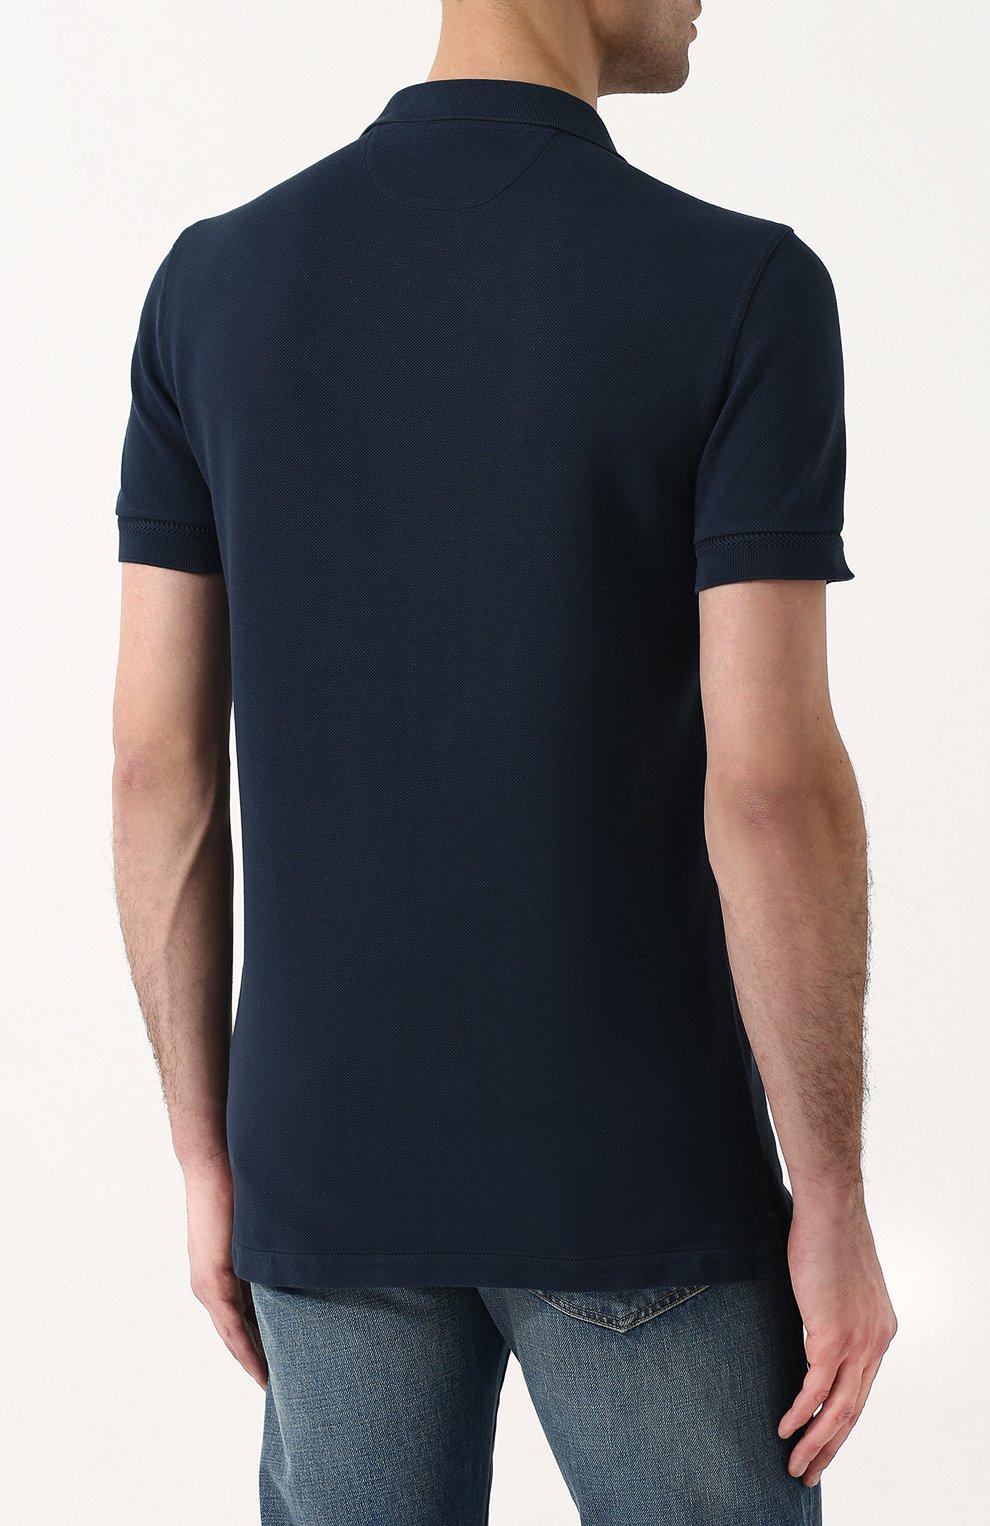 Мужское хлопковое поло с короткими рукавами TOM FORD синего цвета, арт. BP331/TFJ664 | Фото 4